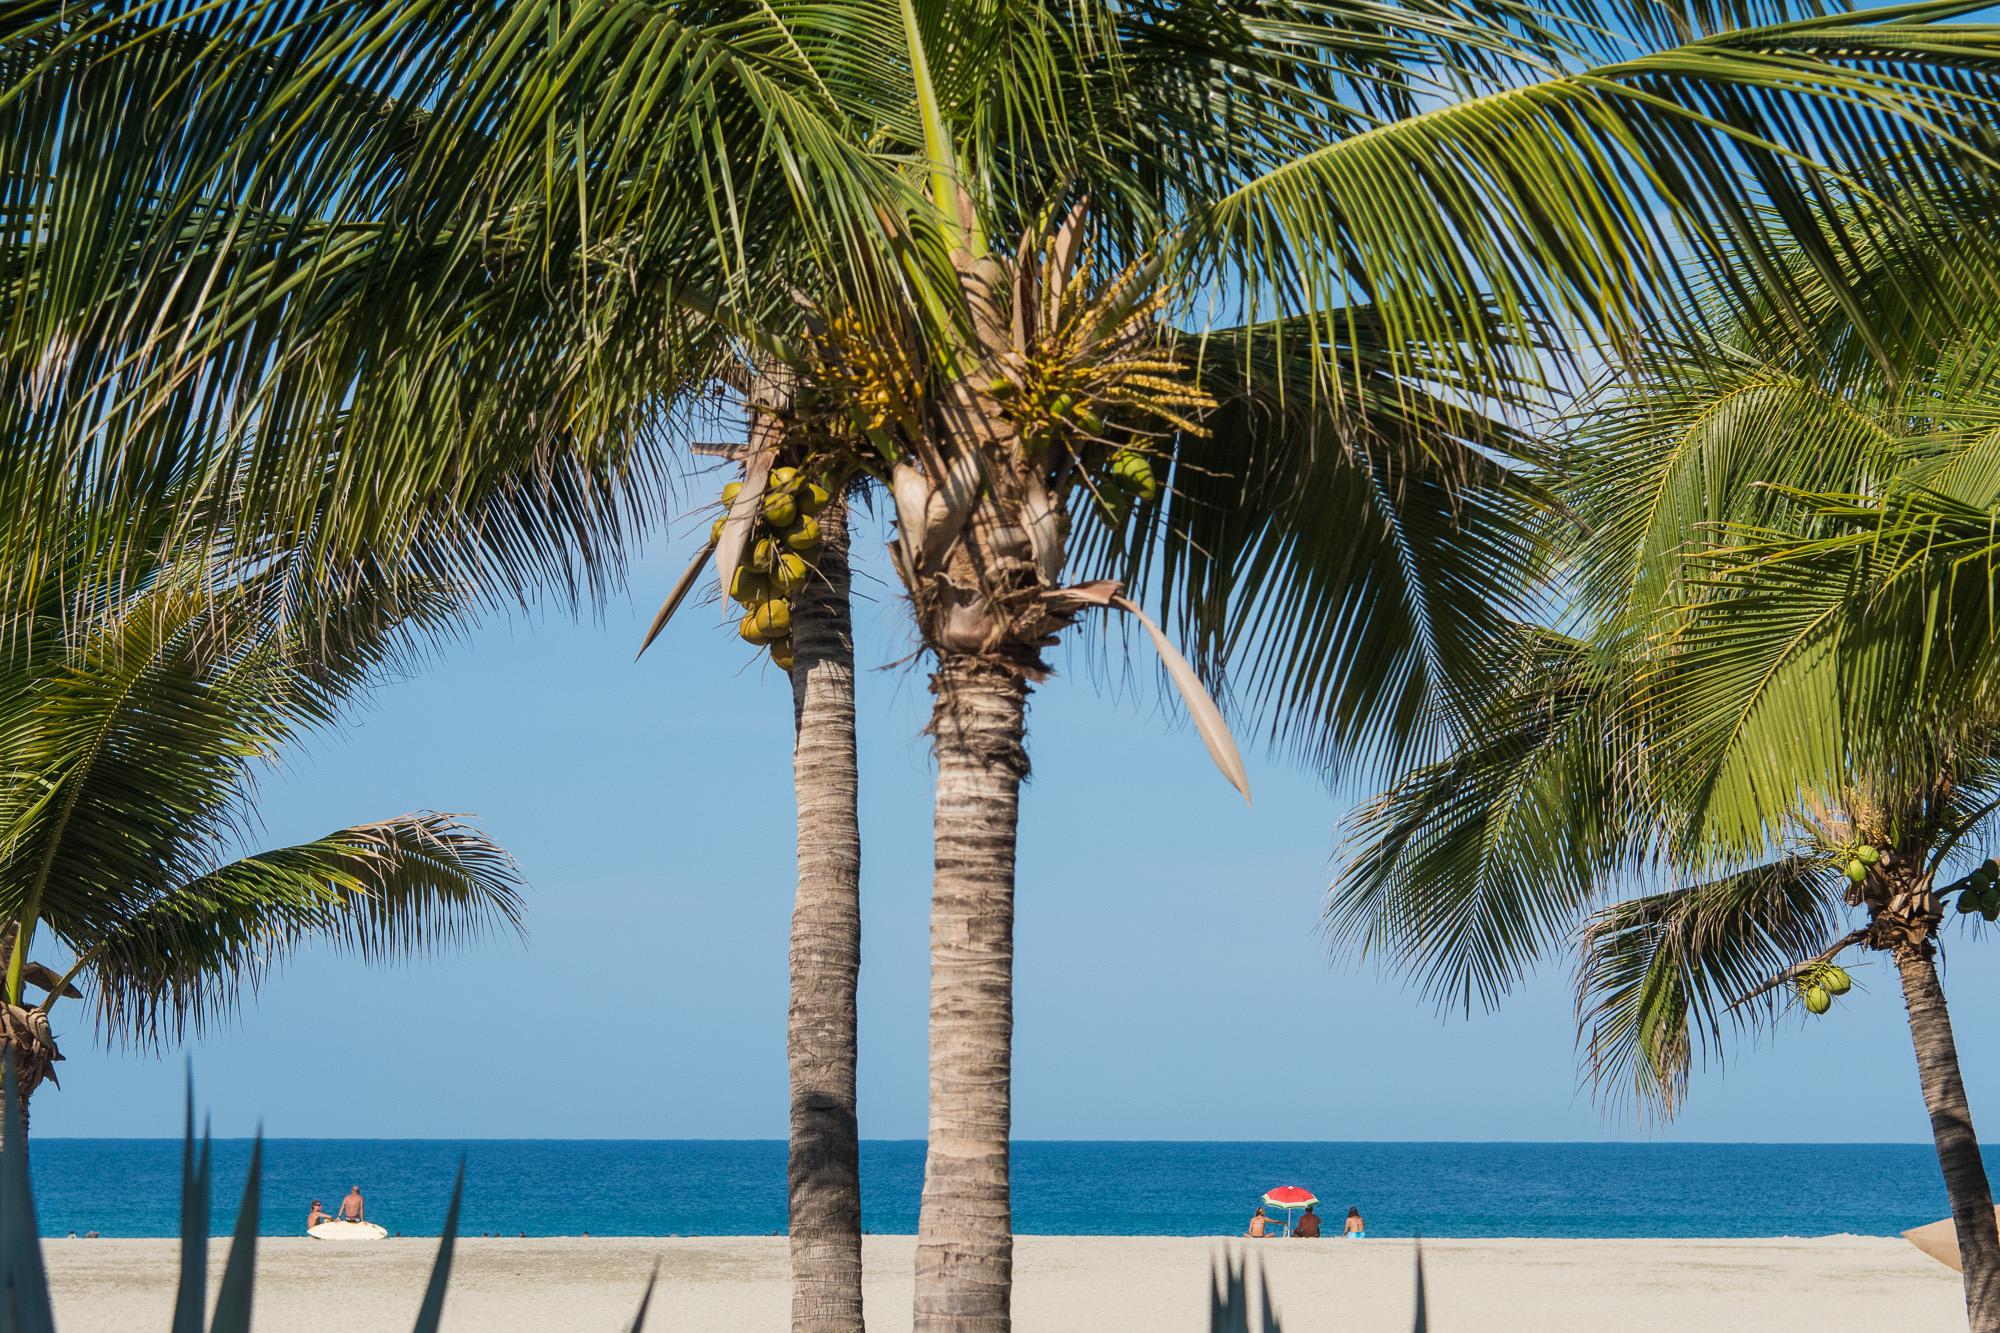 Coconut Palms & White Sand